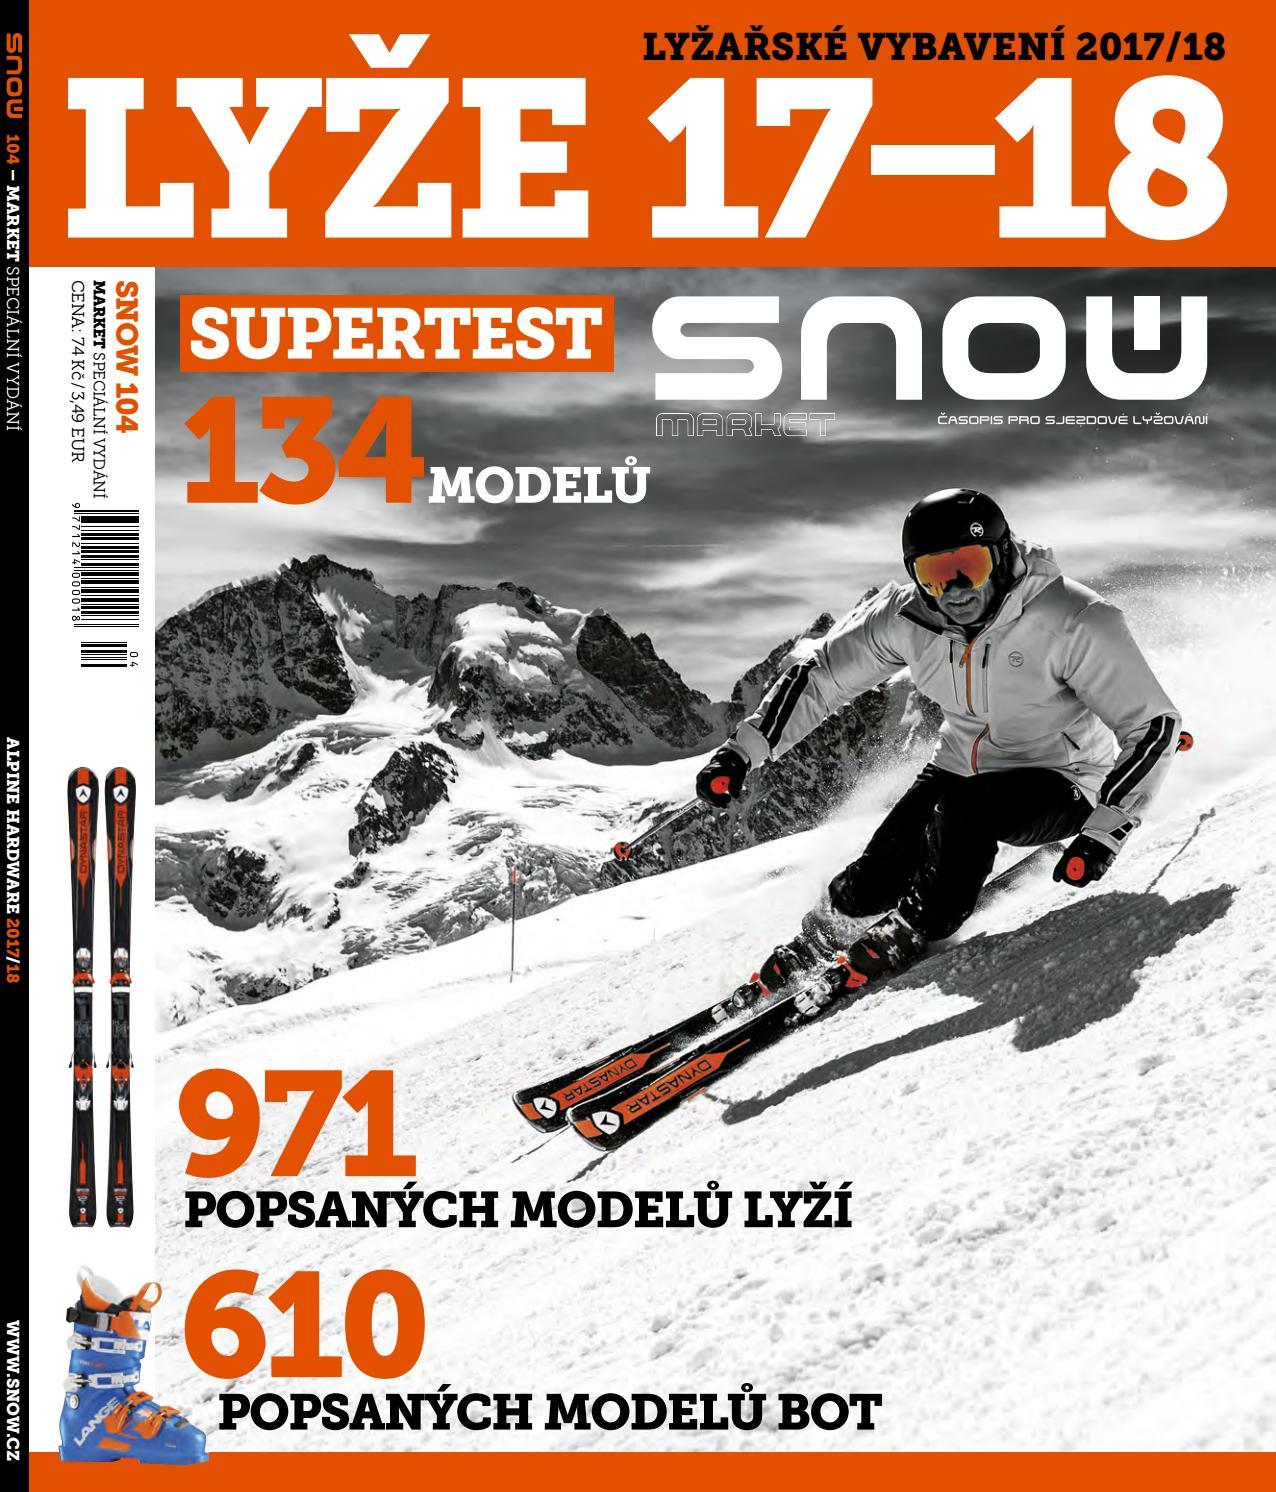 SNOW 104 market - lyžařské vybavení 2017 18 by SNOW CZ s.r.o. - issuu 11c9d92ae1